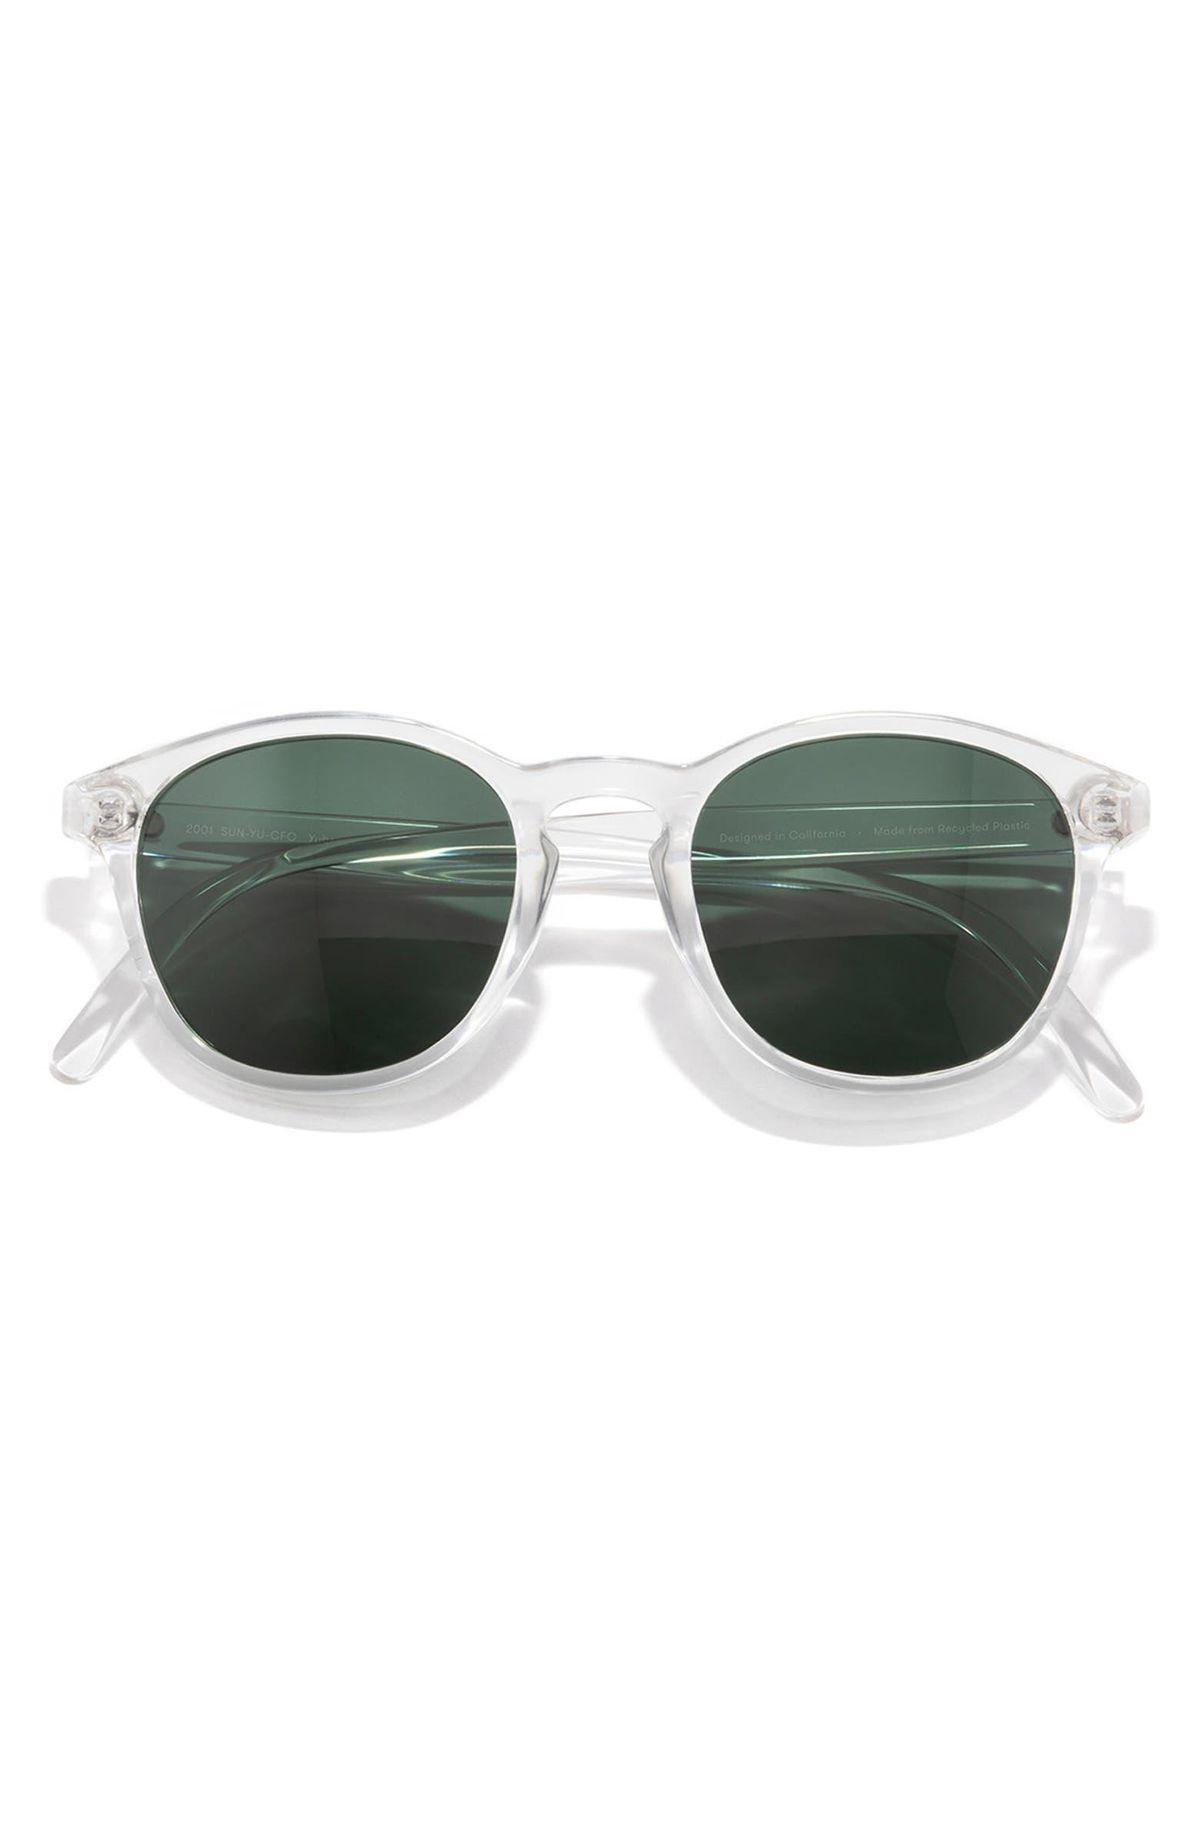 Yuba 48mm Polarized Sunglasses